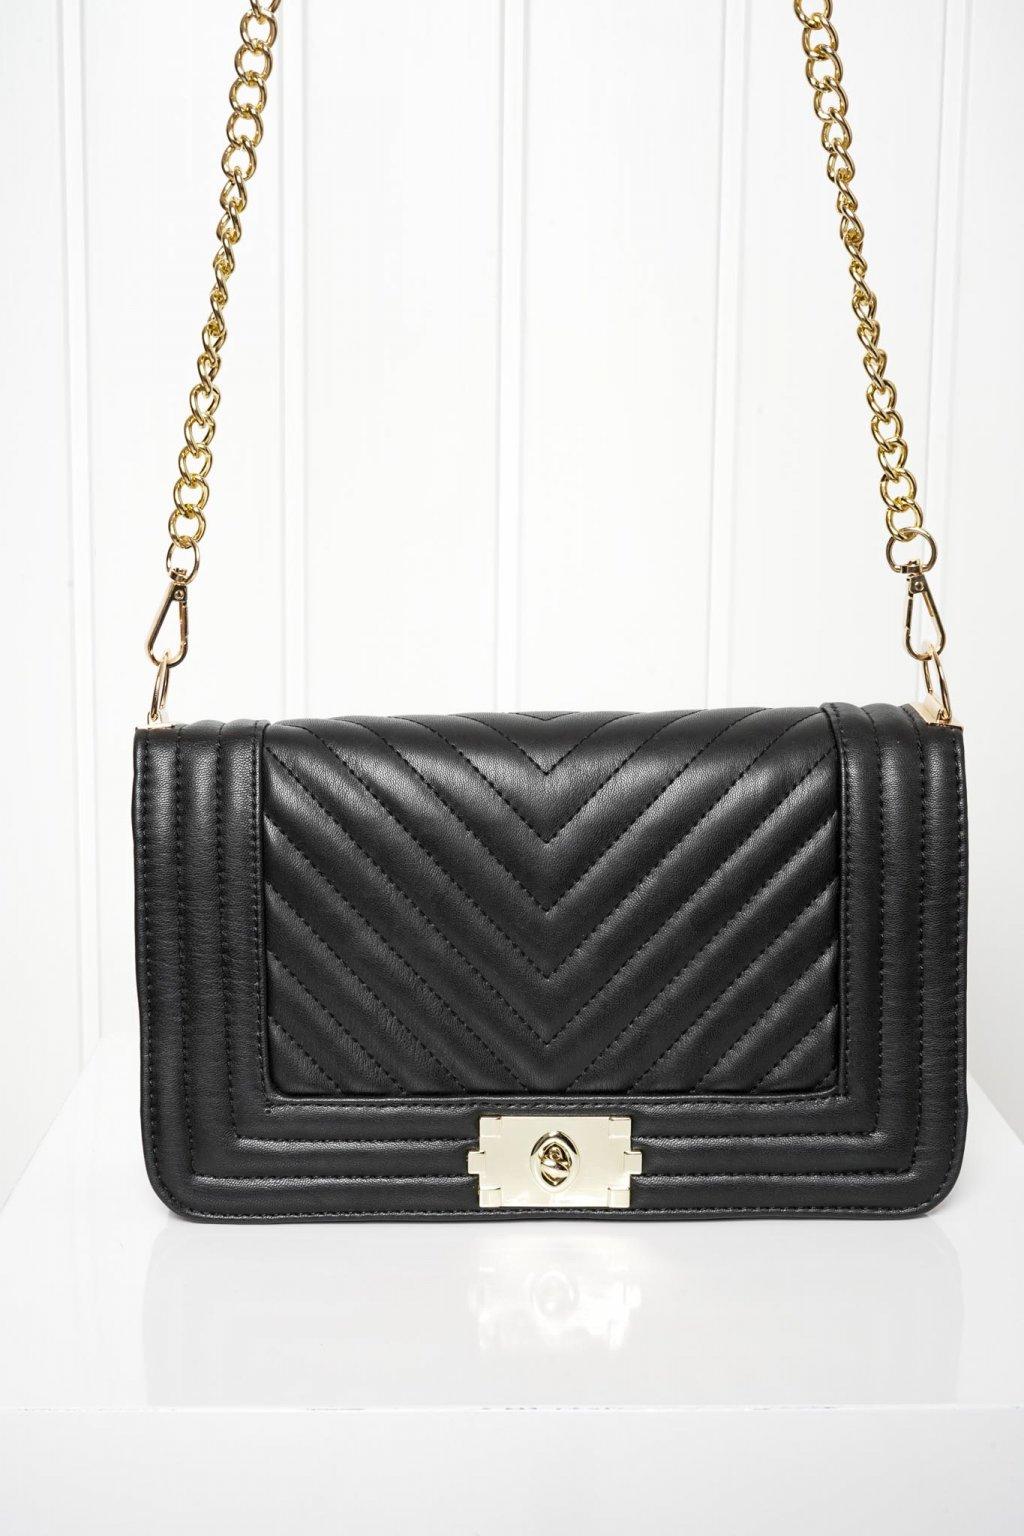 Kabelka, crossbody, ruksak, shopping bag, shopperka, 099